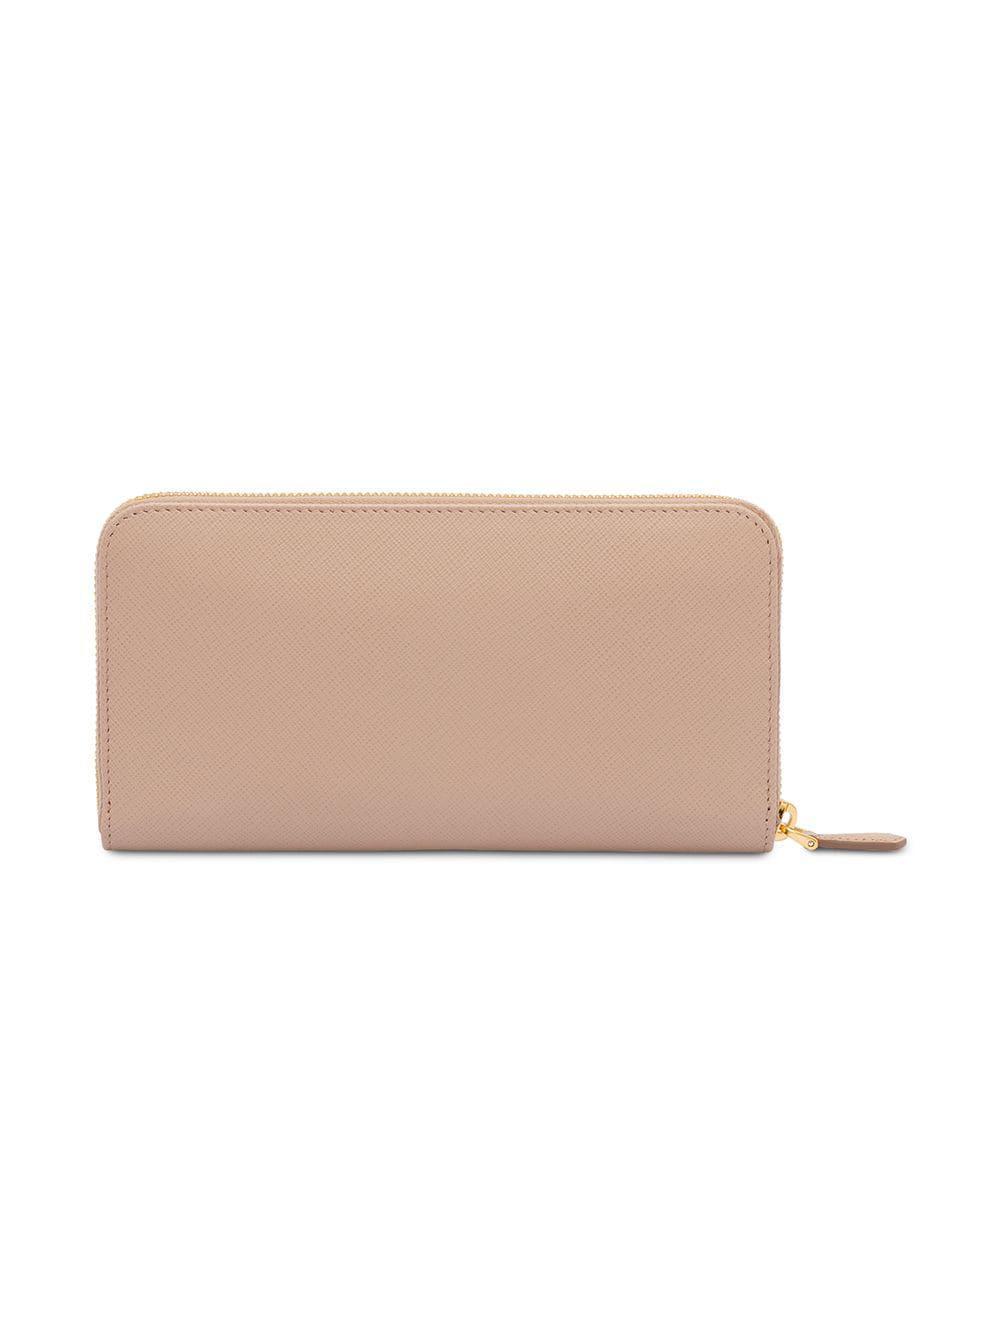 6cc30481e4bd Lyst - Prada Logo Plaque Wallet in Pink